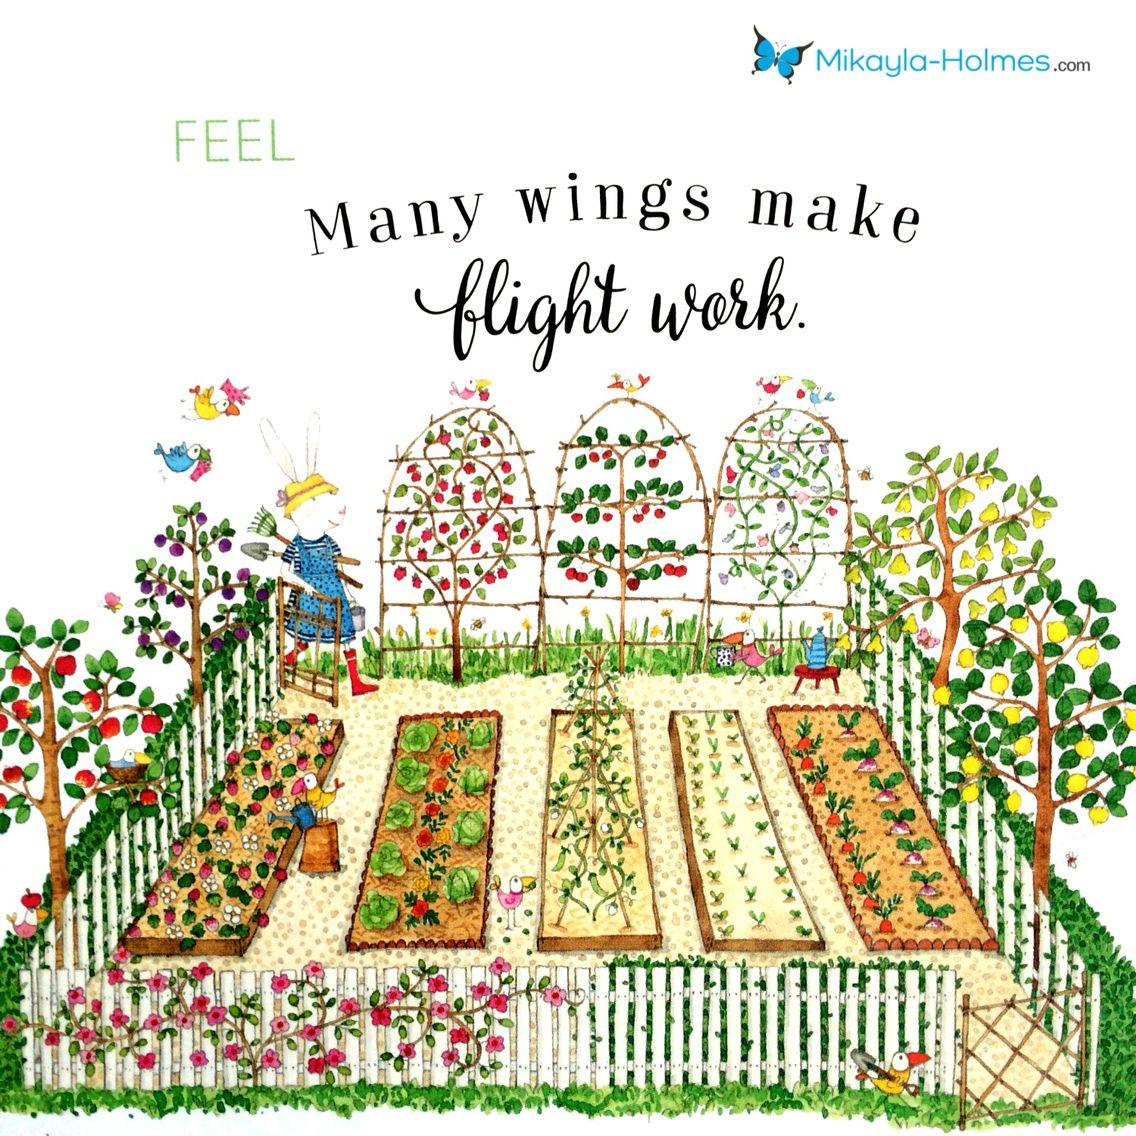 Happy Monday. #enjoy #new #peace #work #together #mikayla